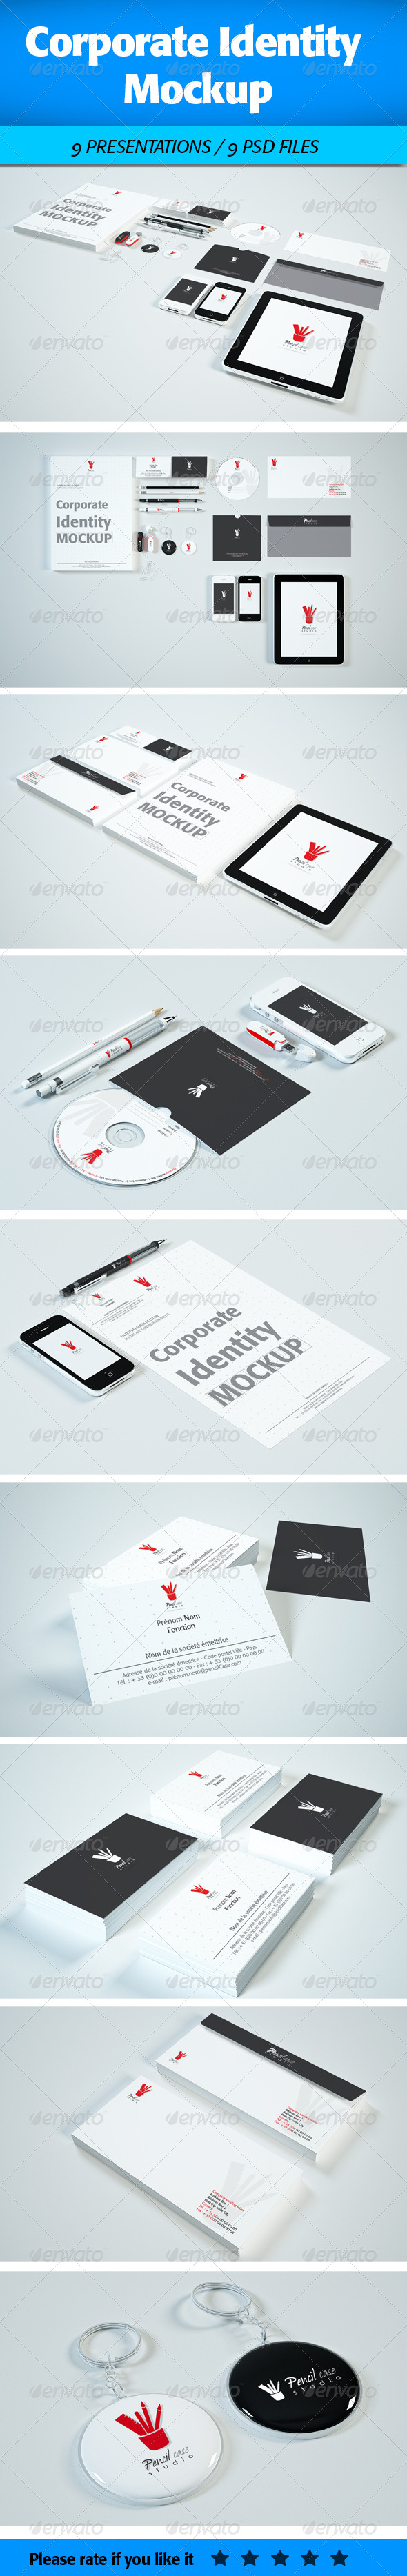 GraphicRiver Corporate Identity Mock-Up 4629425